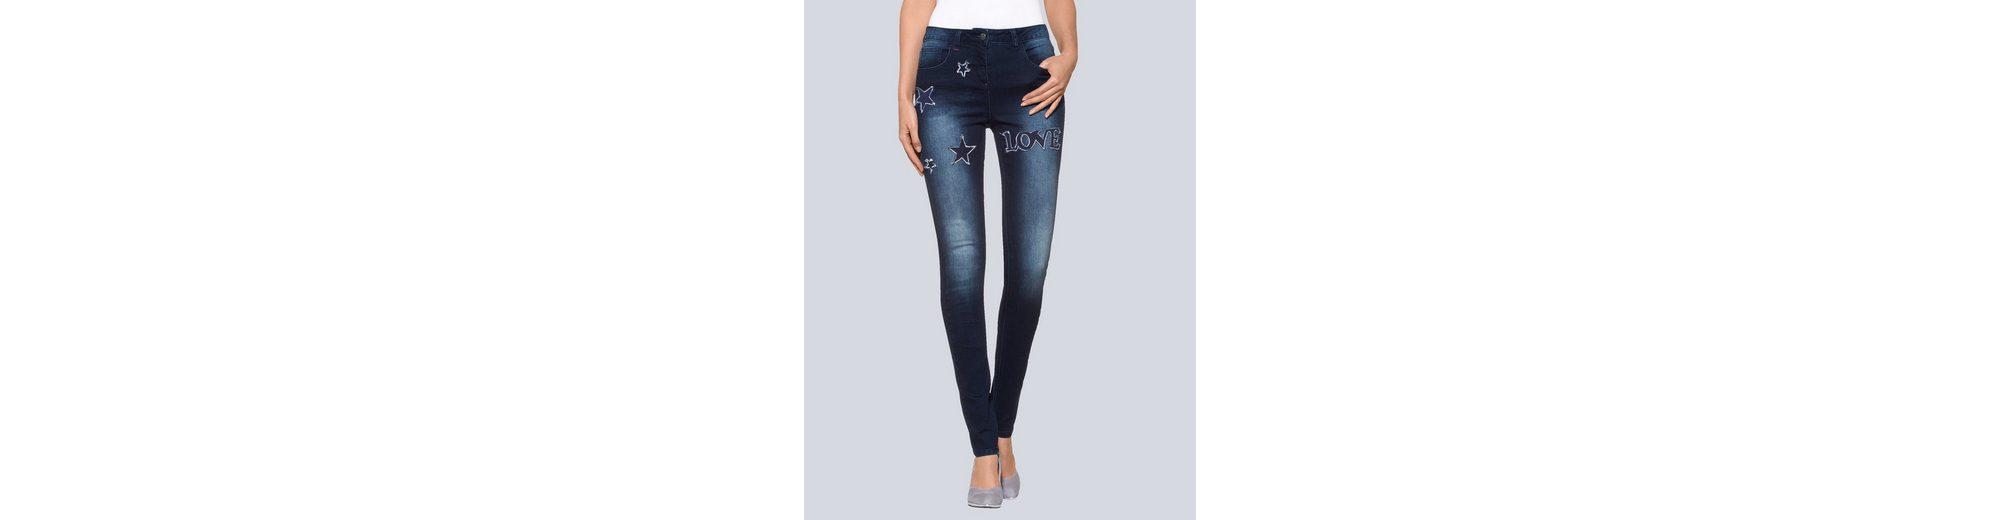 Aberdeen Alba Moda Skinny-Jeans mit Sternenpatch Auslass-Websites Besonders Verkauf rAAwA4